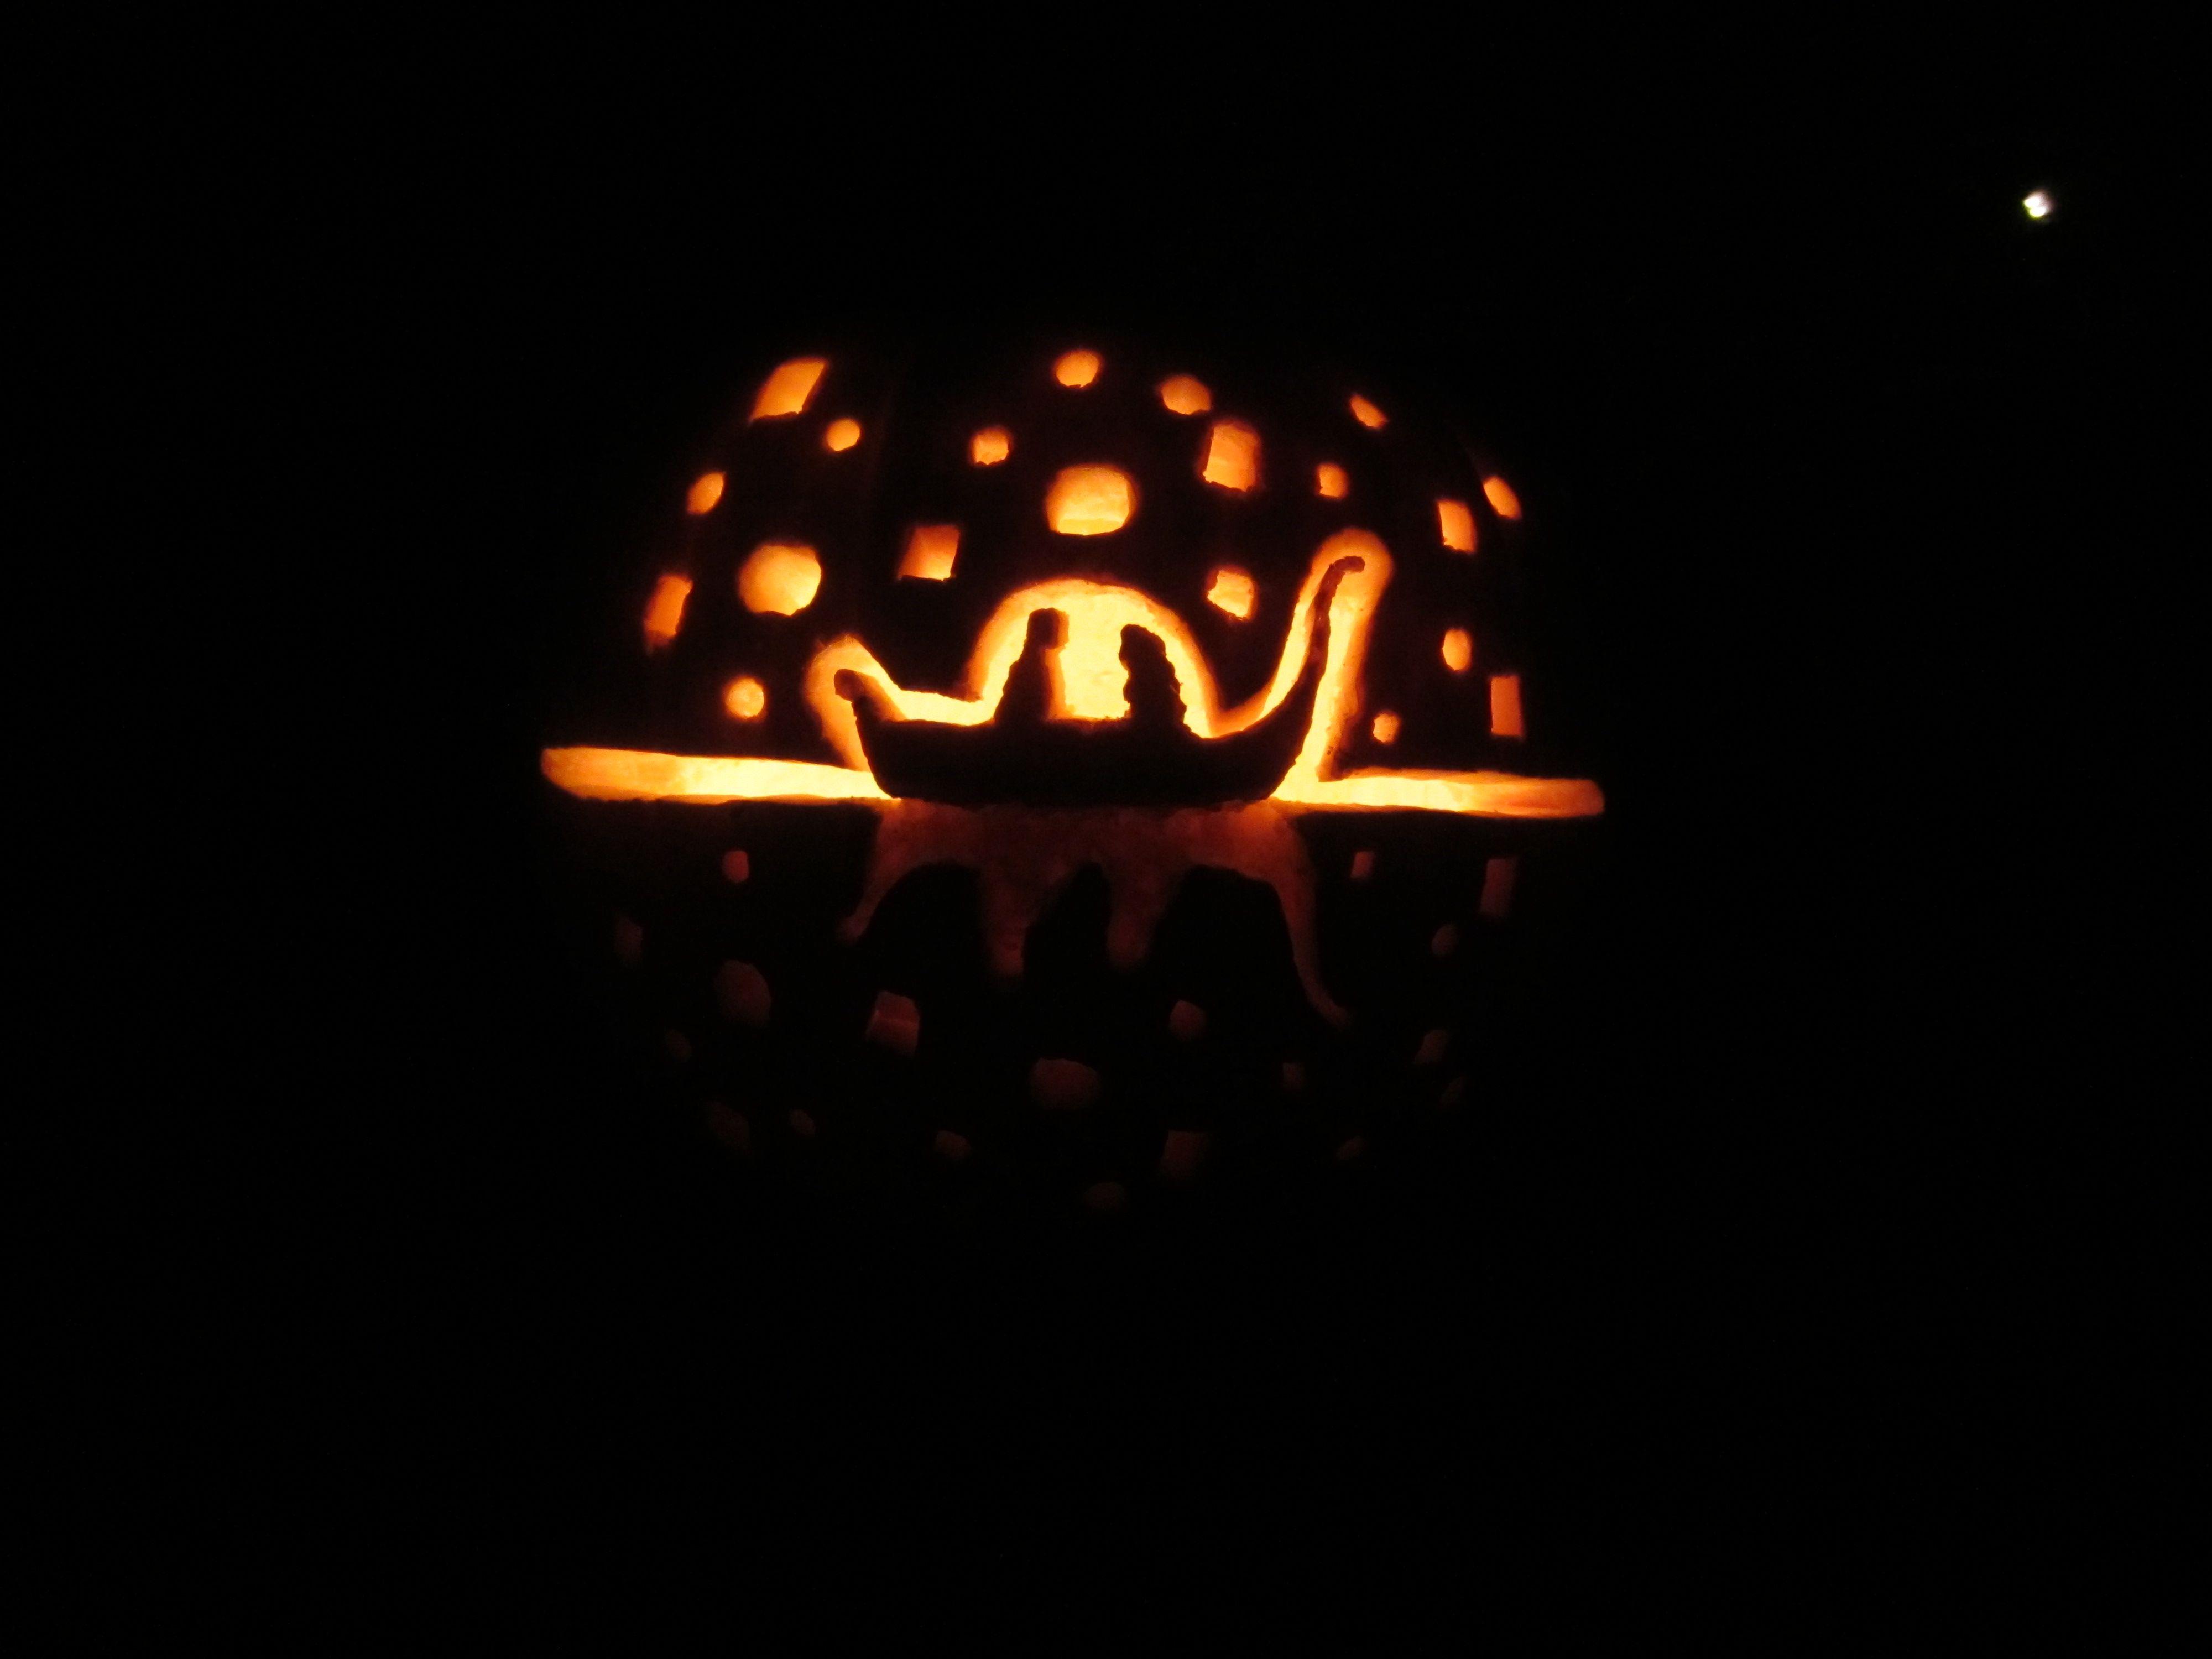 Tangled Pumpkin I See The Light I Want To Go Carve A Pumpkin Now